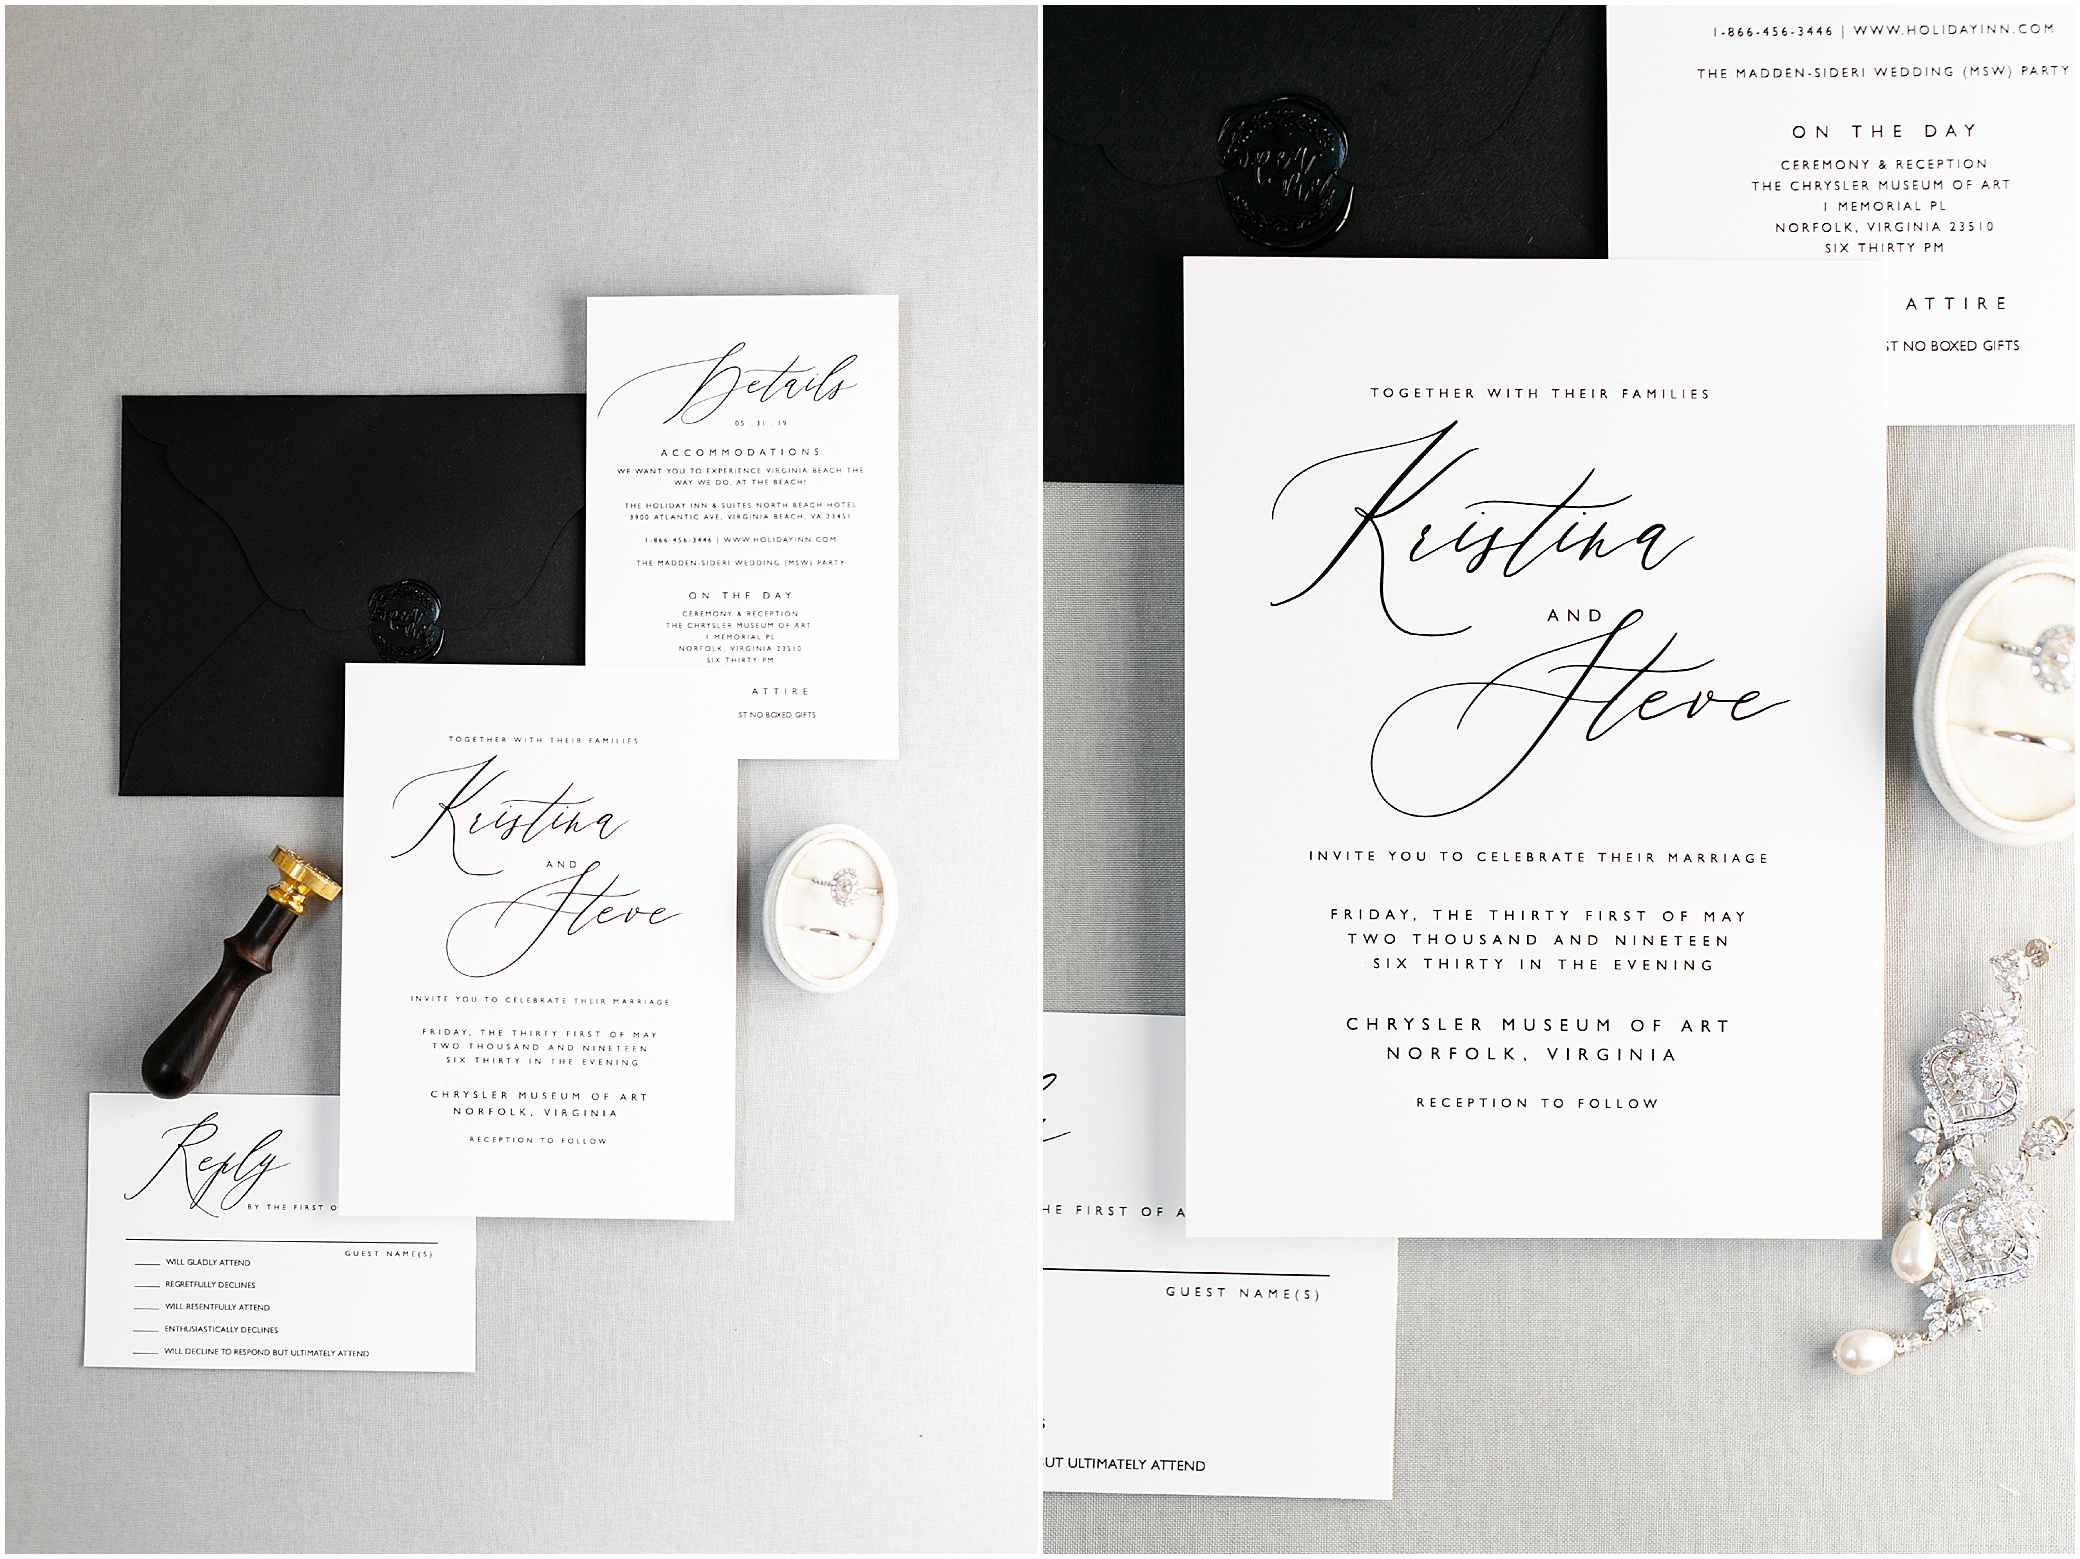 Chrysler museum wedding in Norfolk Virginia, classic black and white wedding invitation